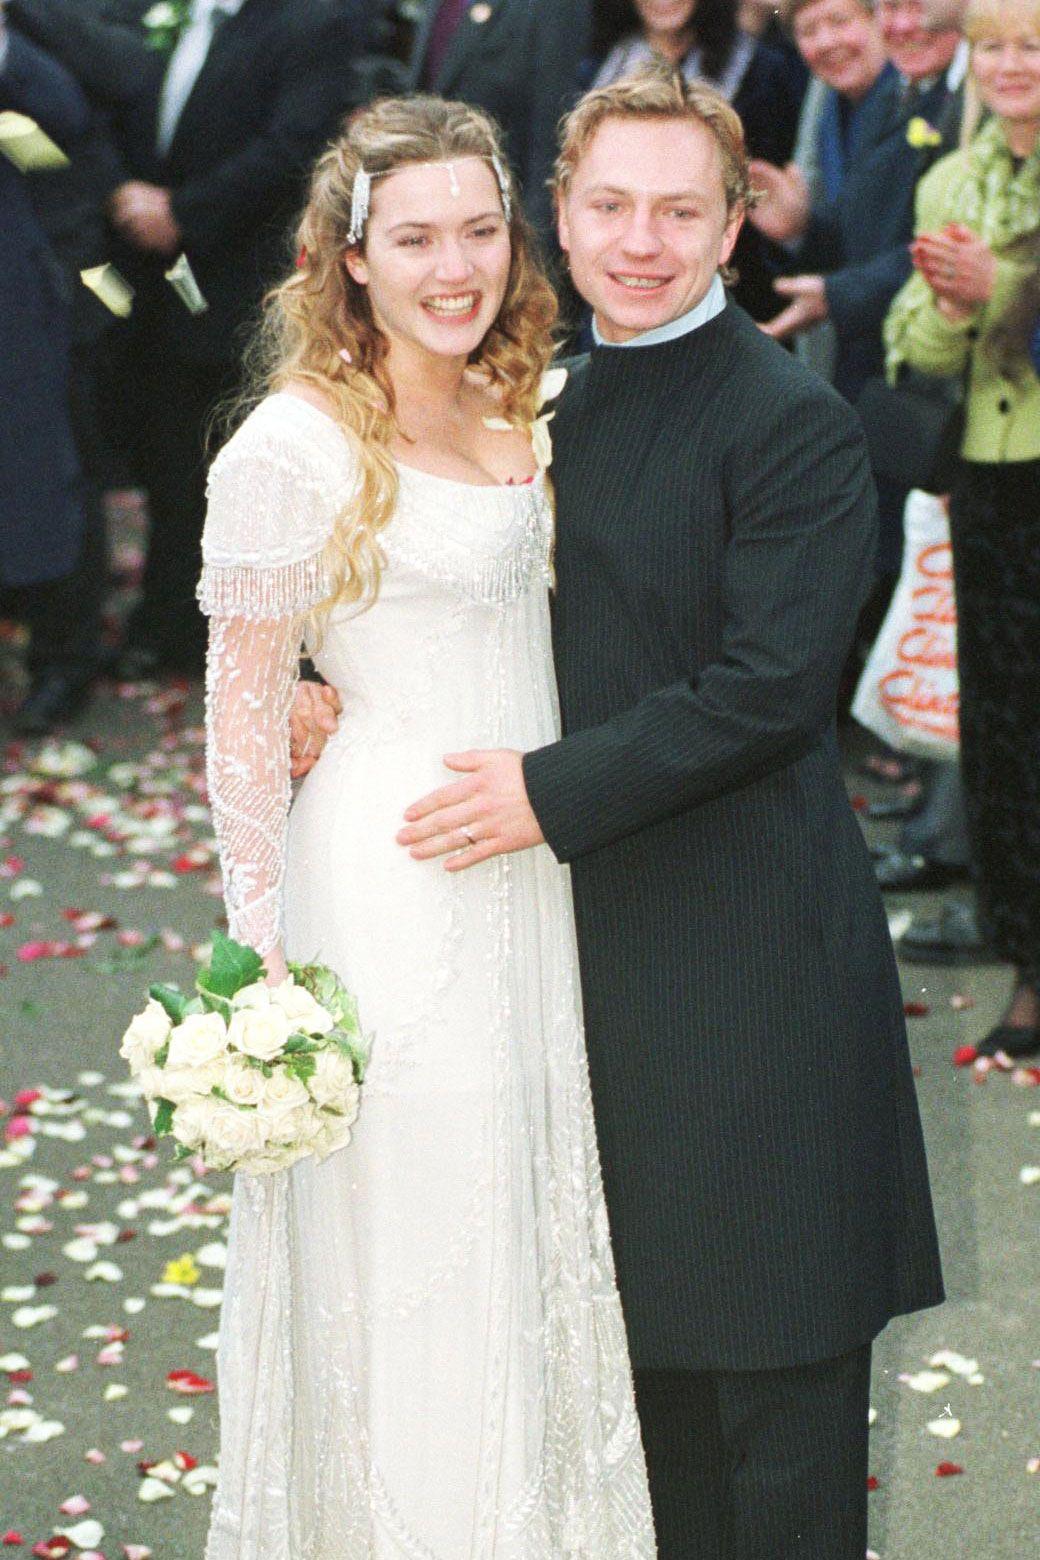 Kate Winslet and ex-husband Jim Threapleton wedding pic